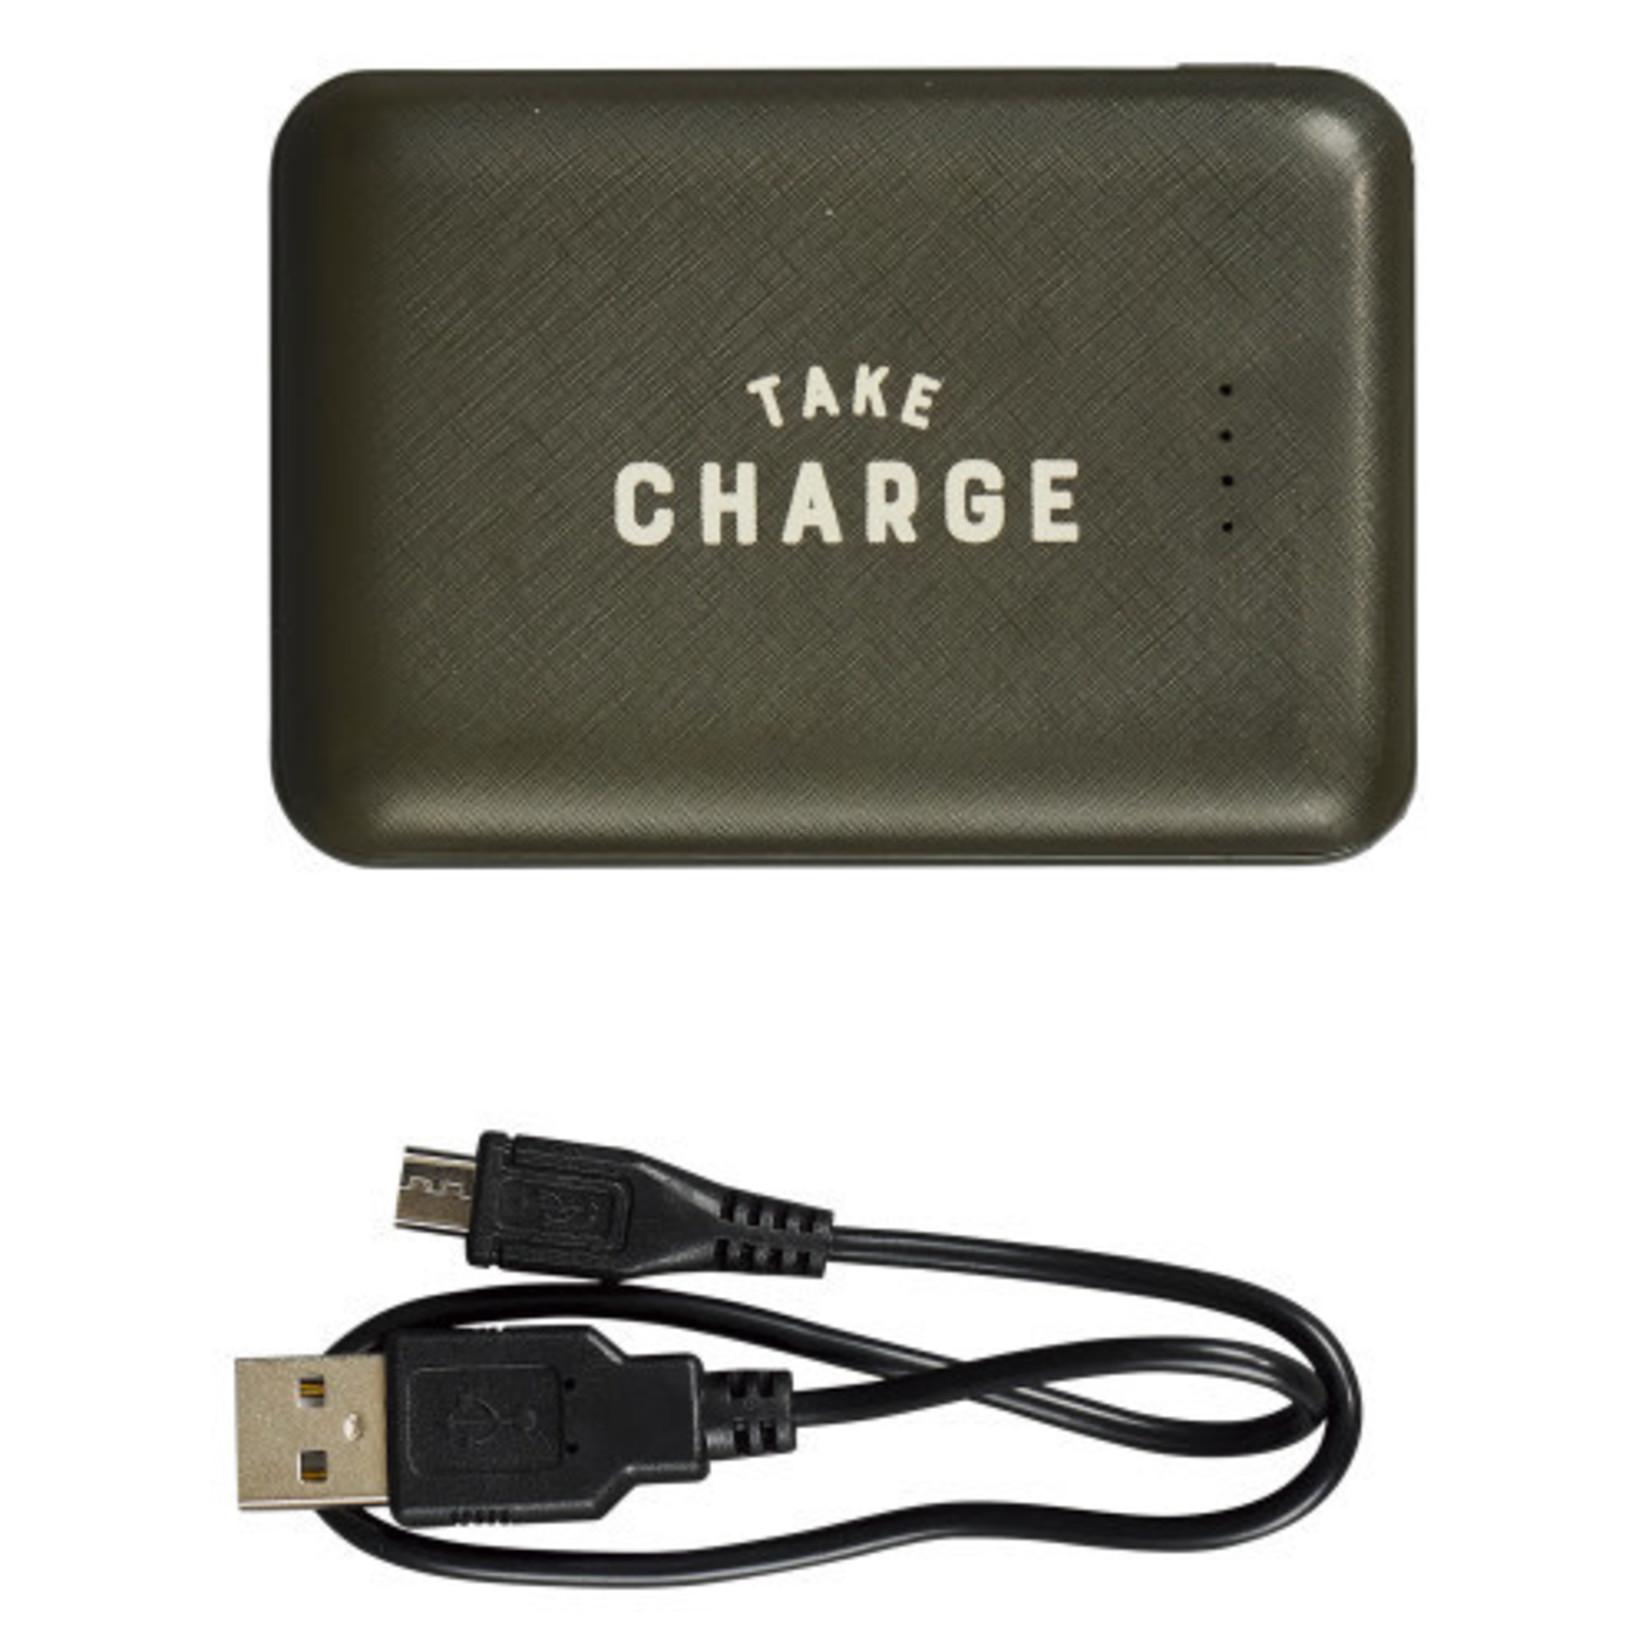 Power Bank Take Charge